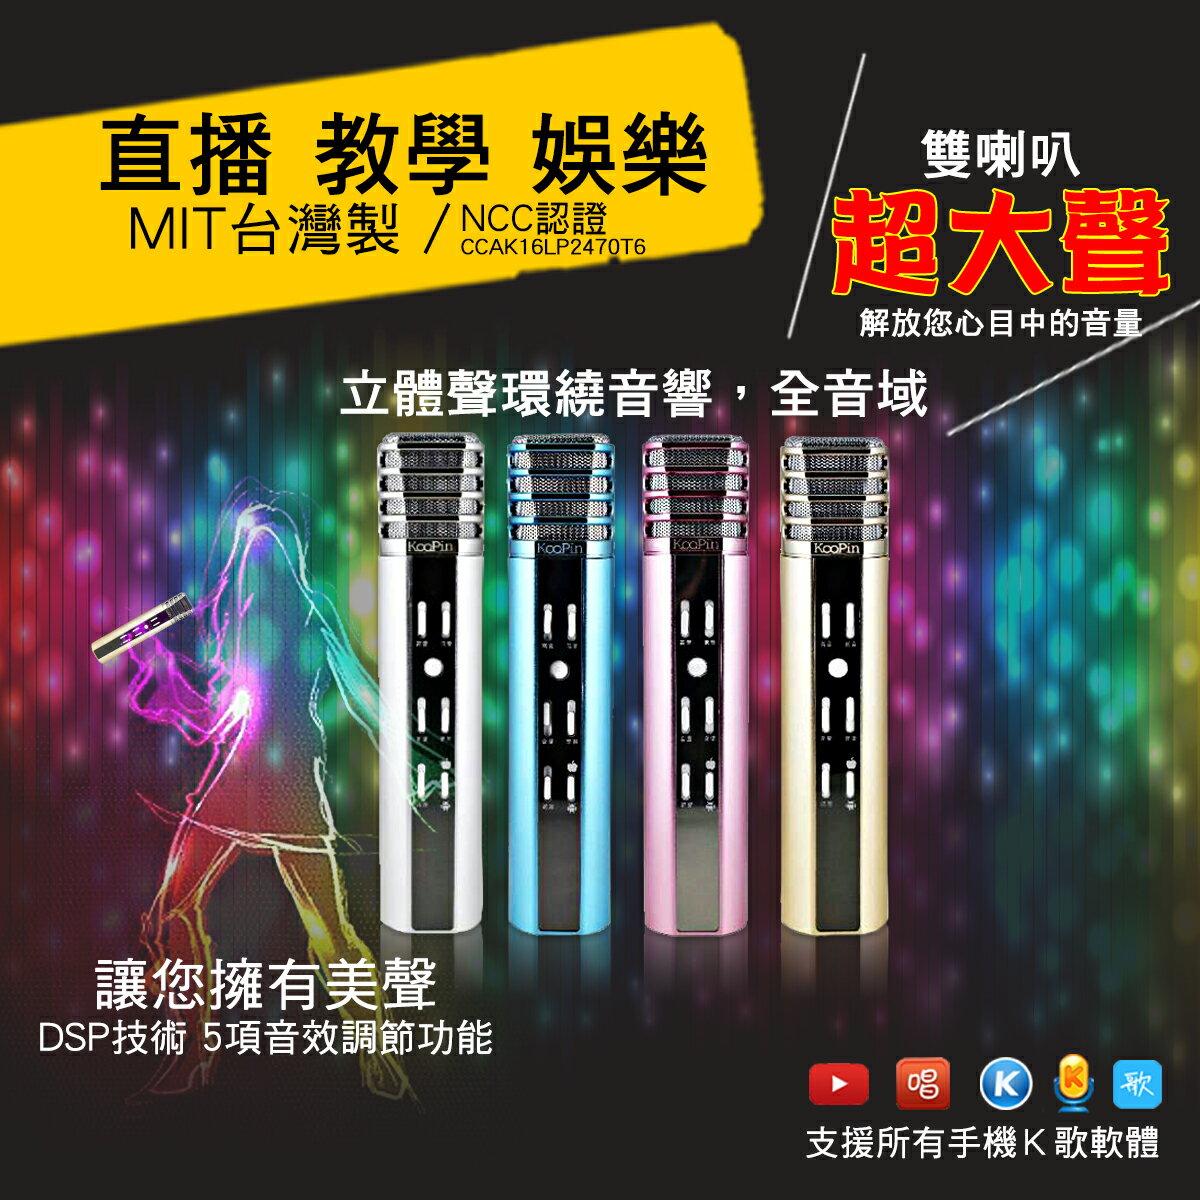 KooPin K8 無線藍牙雙喇叭行動KTV(台灣製造) ~雙認證NCC及BSMI 安全有保障~